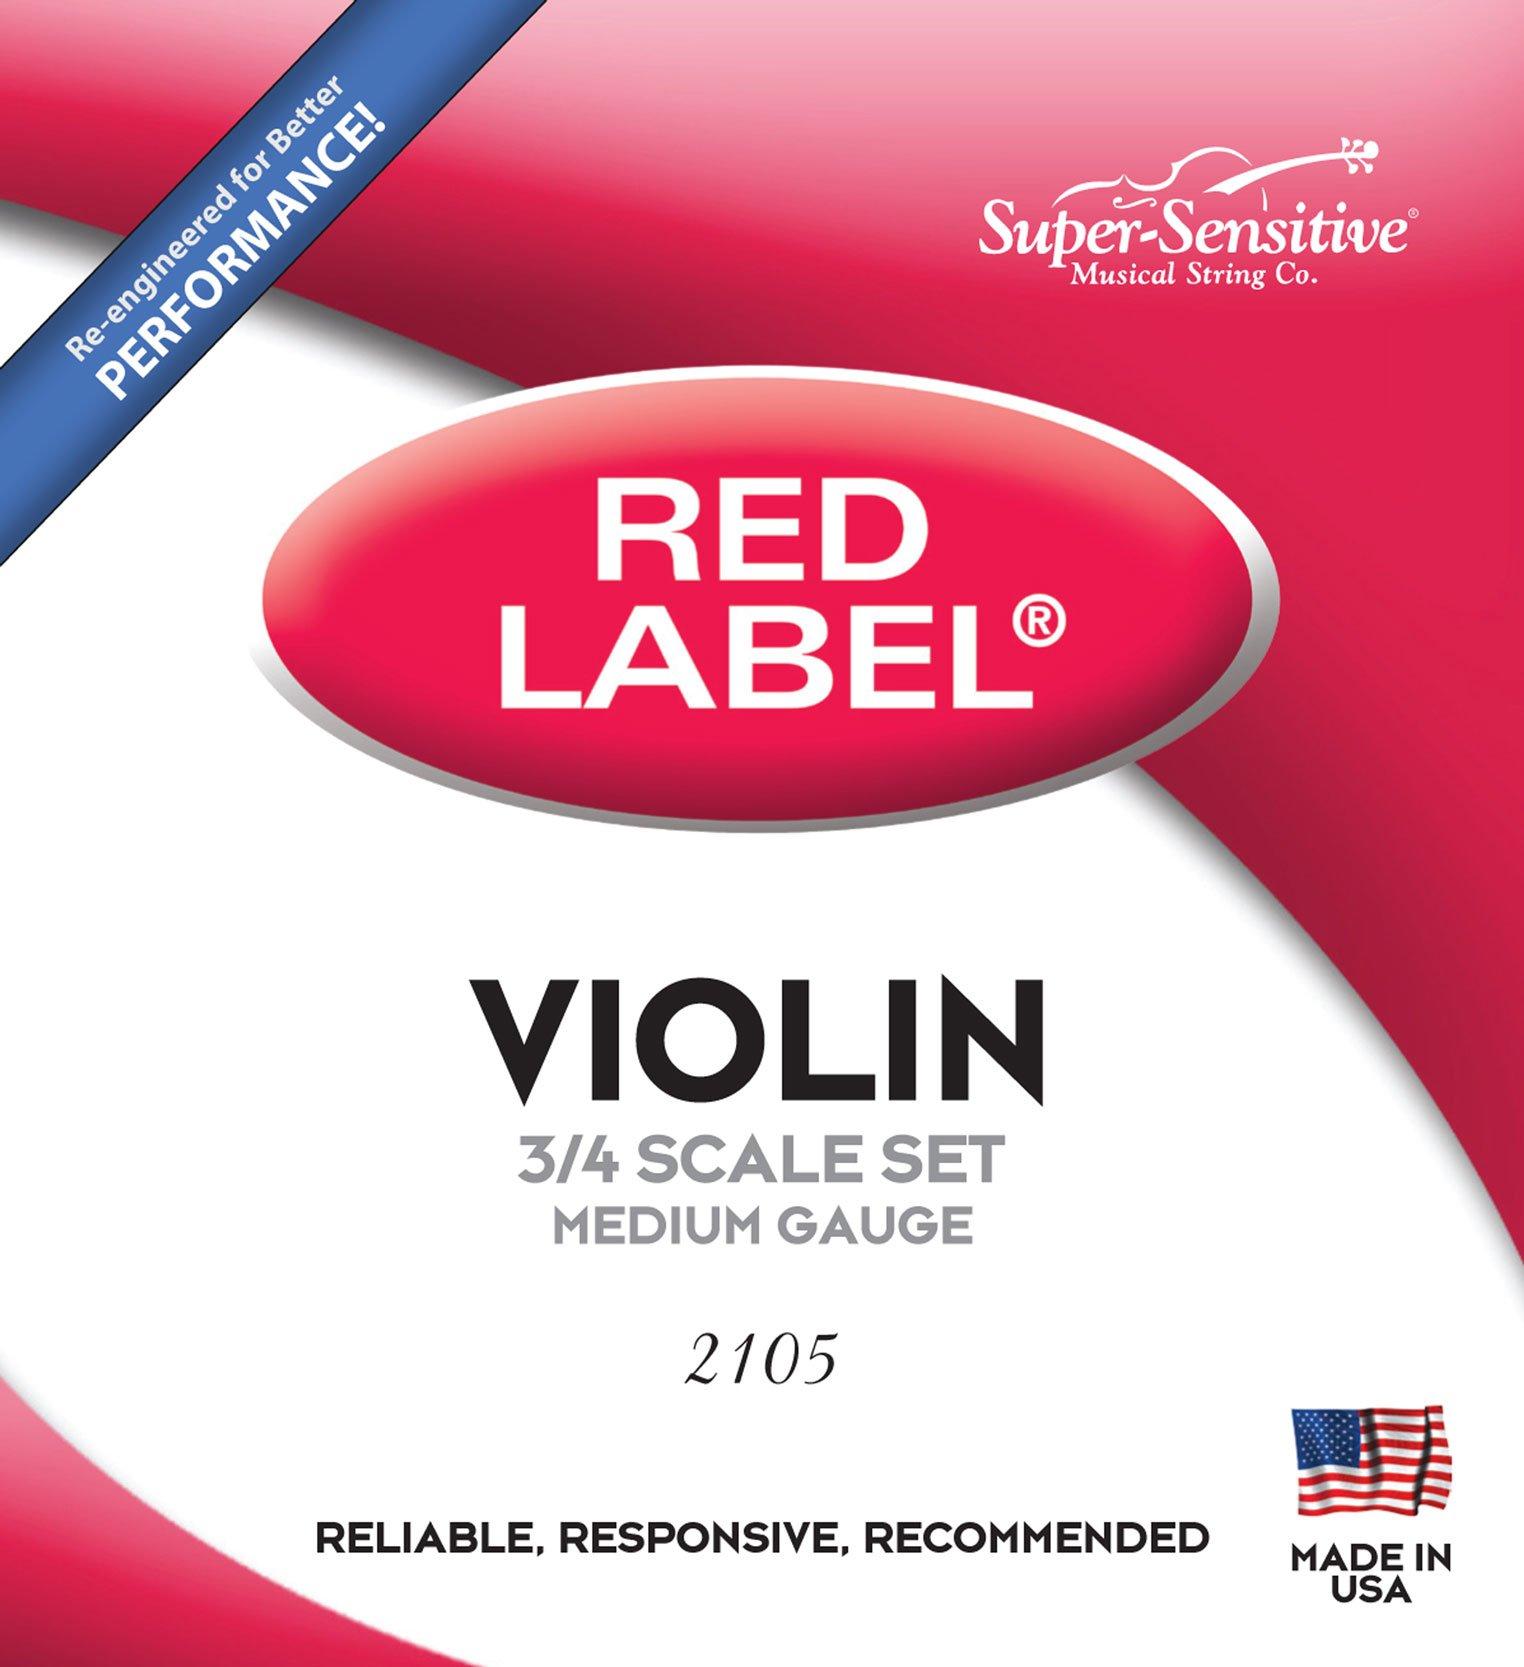 Super Sensitive Steelcore 3/4 Violin Strings: Set